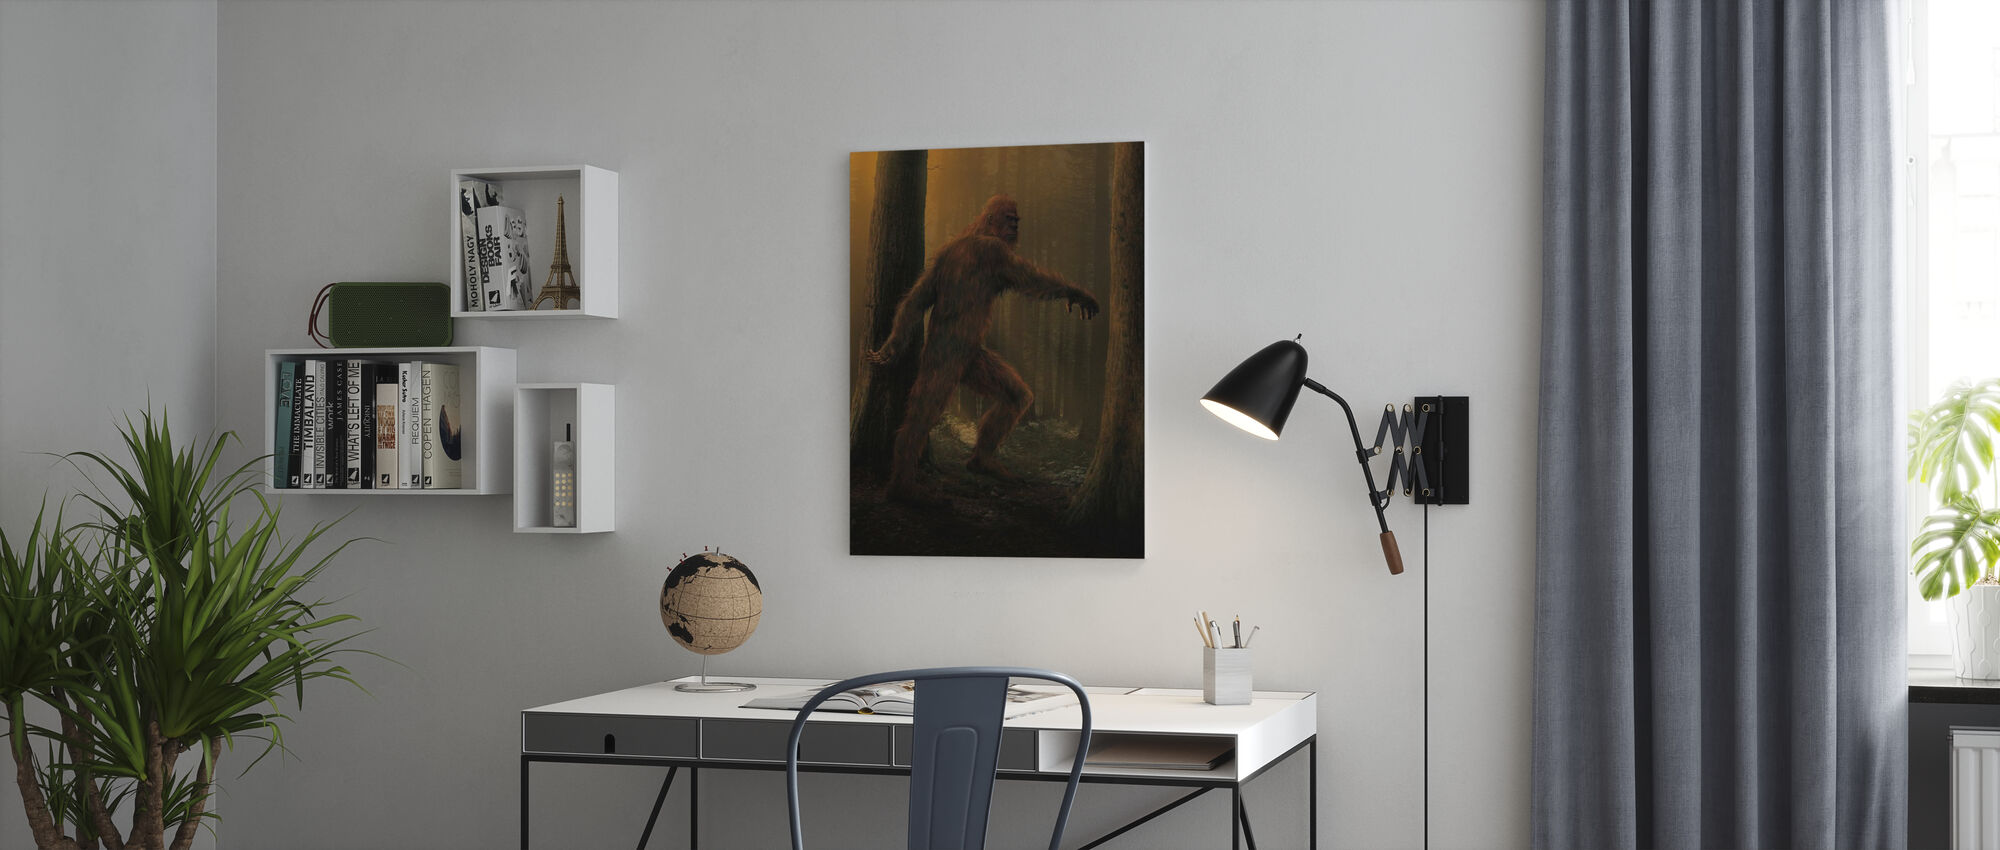 Bigfoot - Canvastavla - Kontor